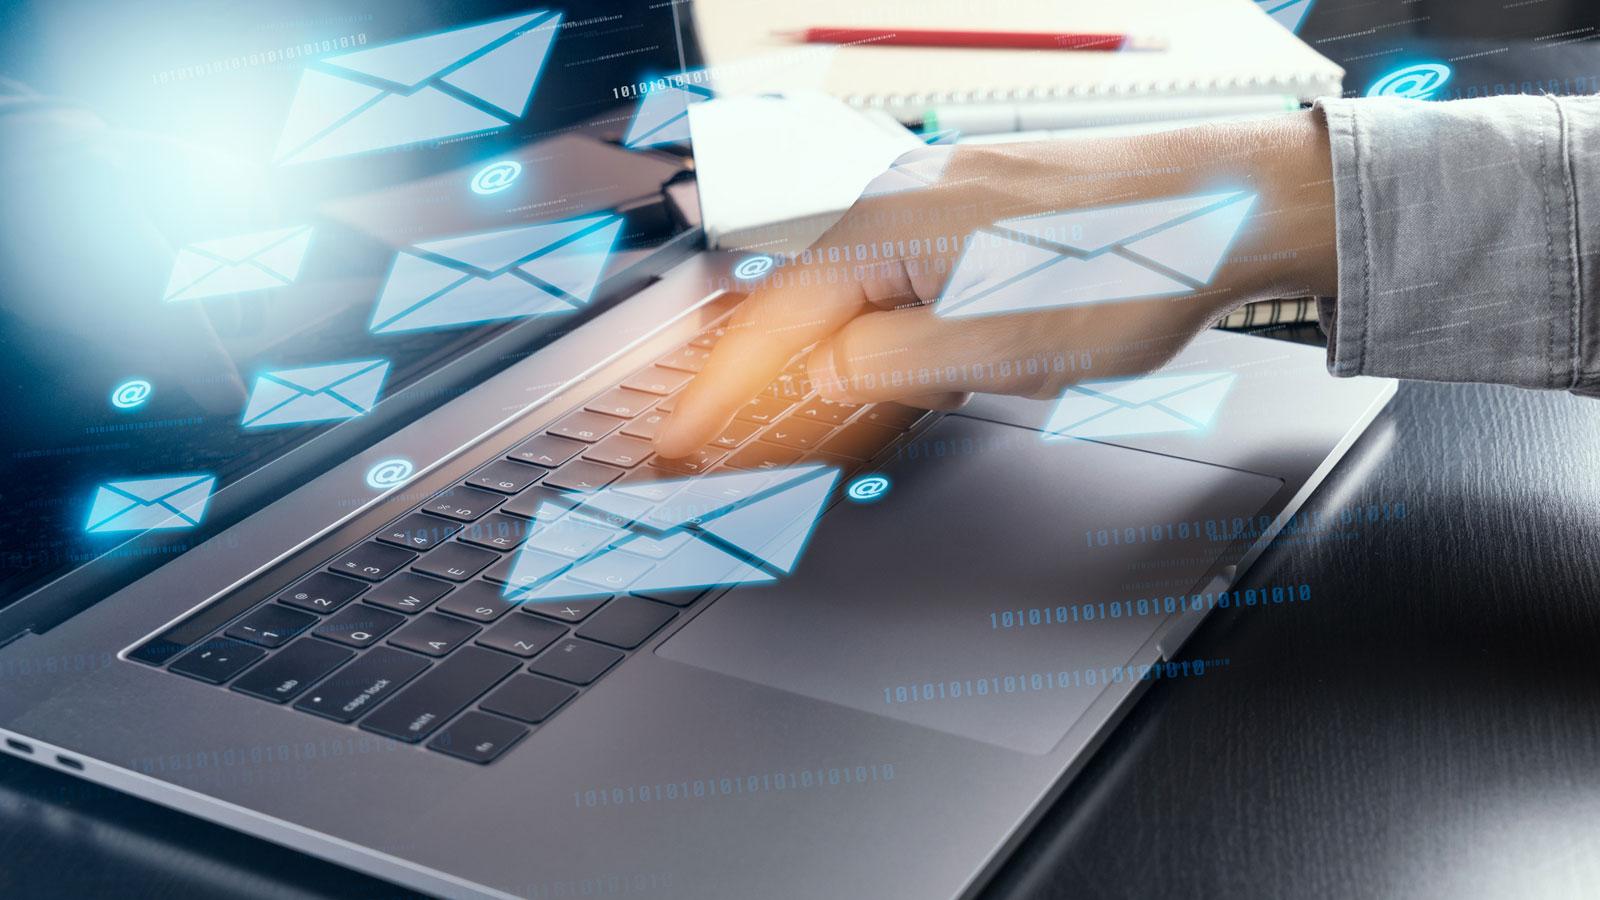 Outlook-Alternativen: 5 beliebte E-Mail-Anbieter im Überblick